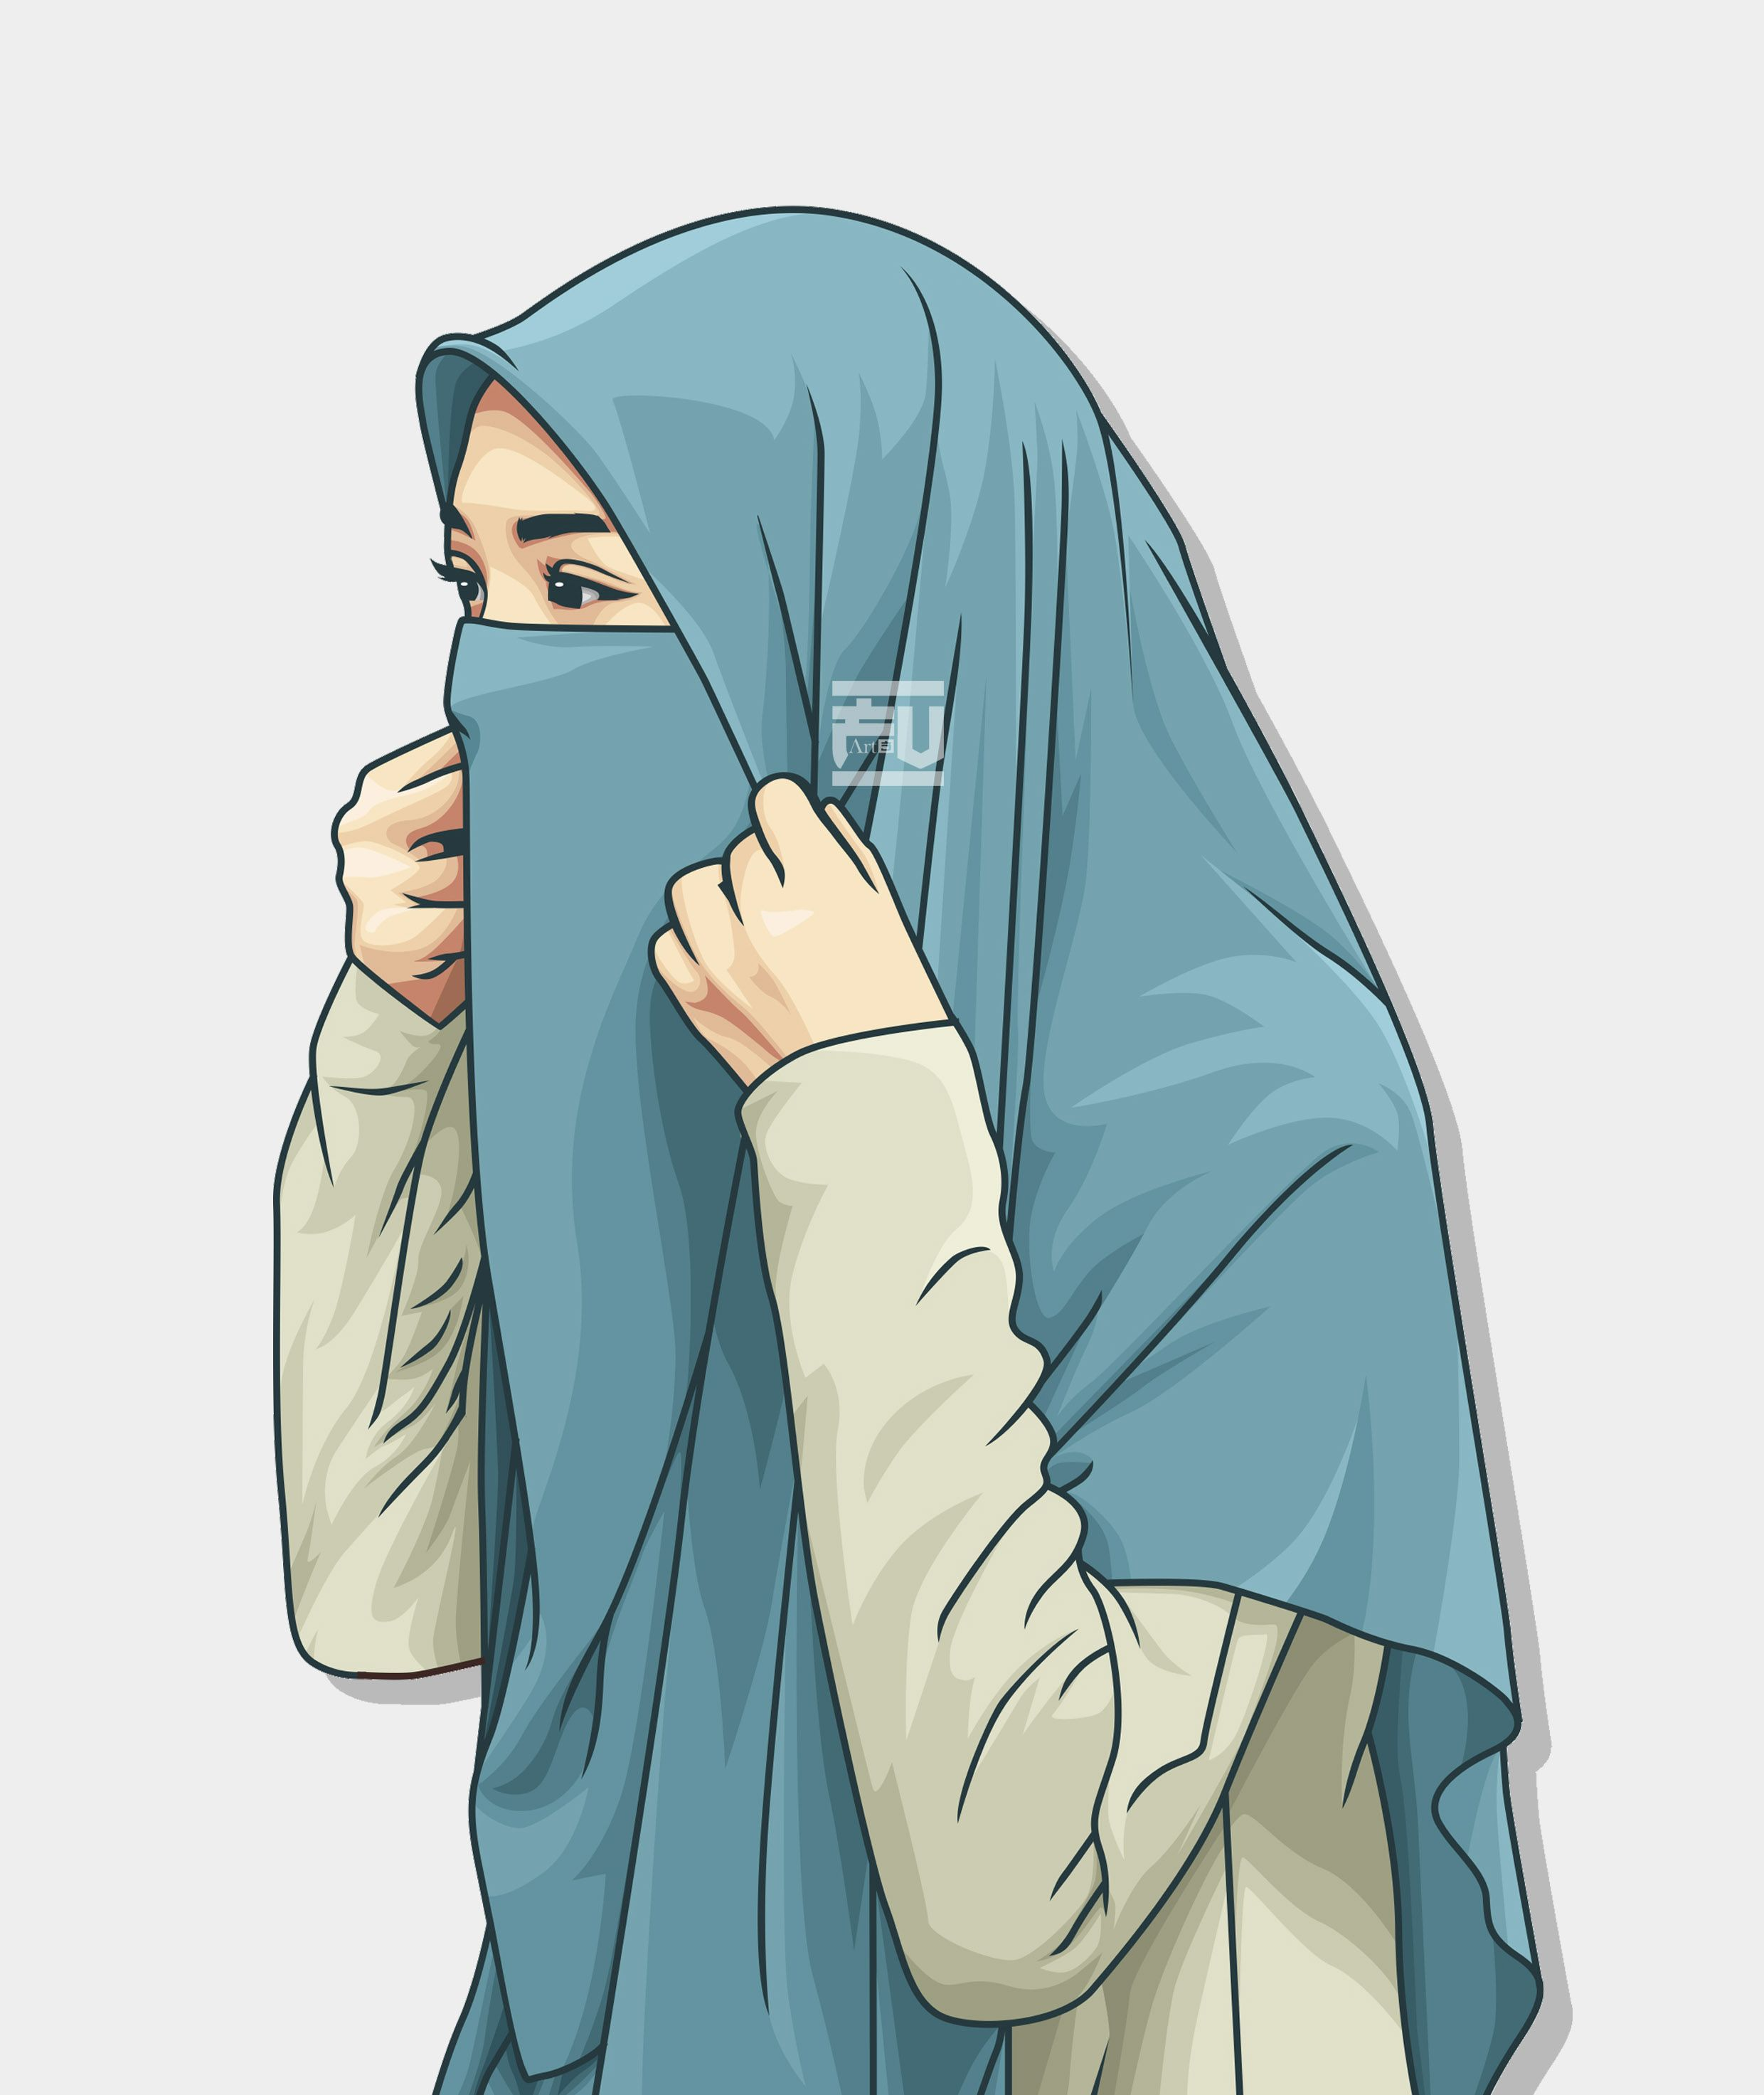 Pin oleh Frisca Diary di Hijab (Cartoon and Quotes